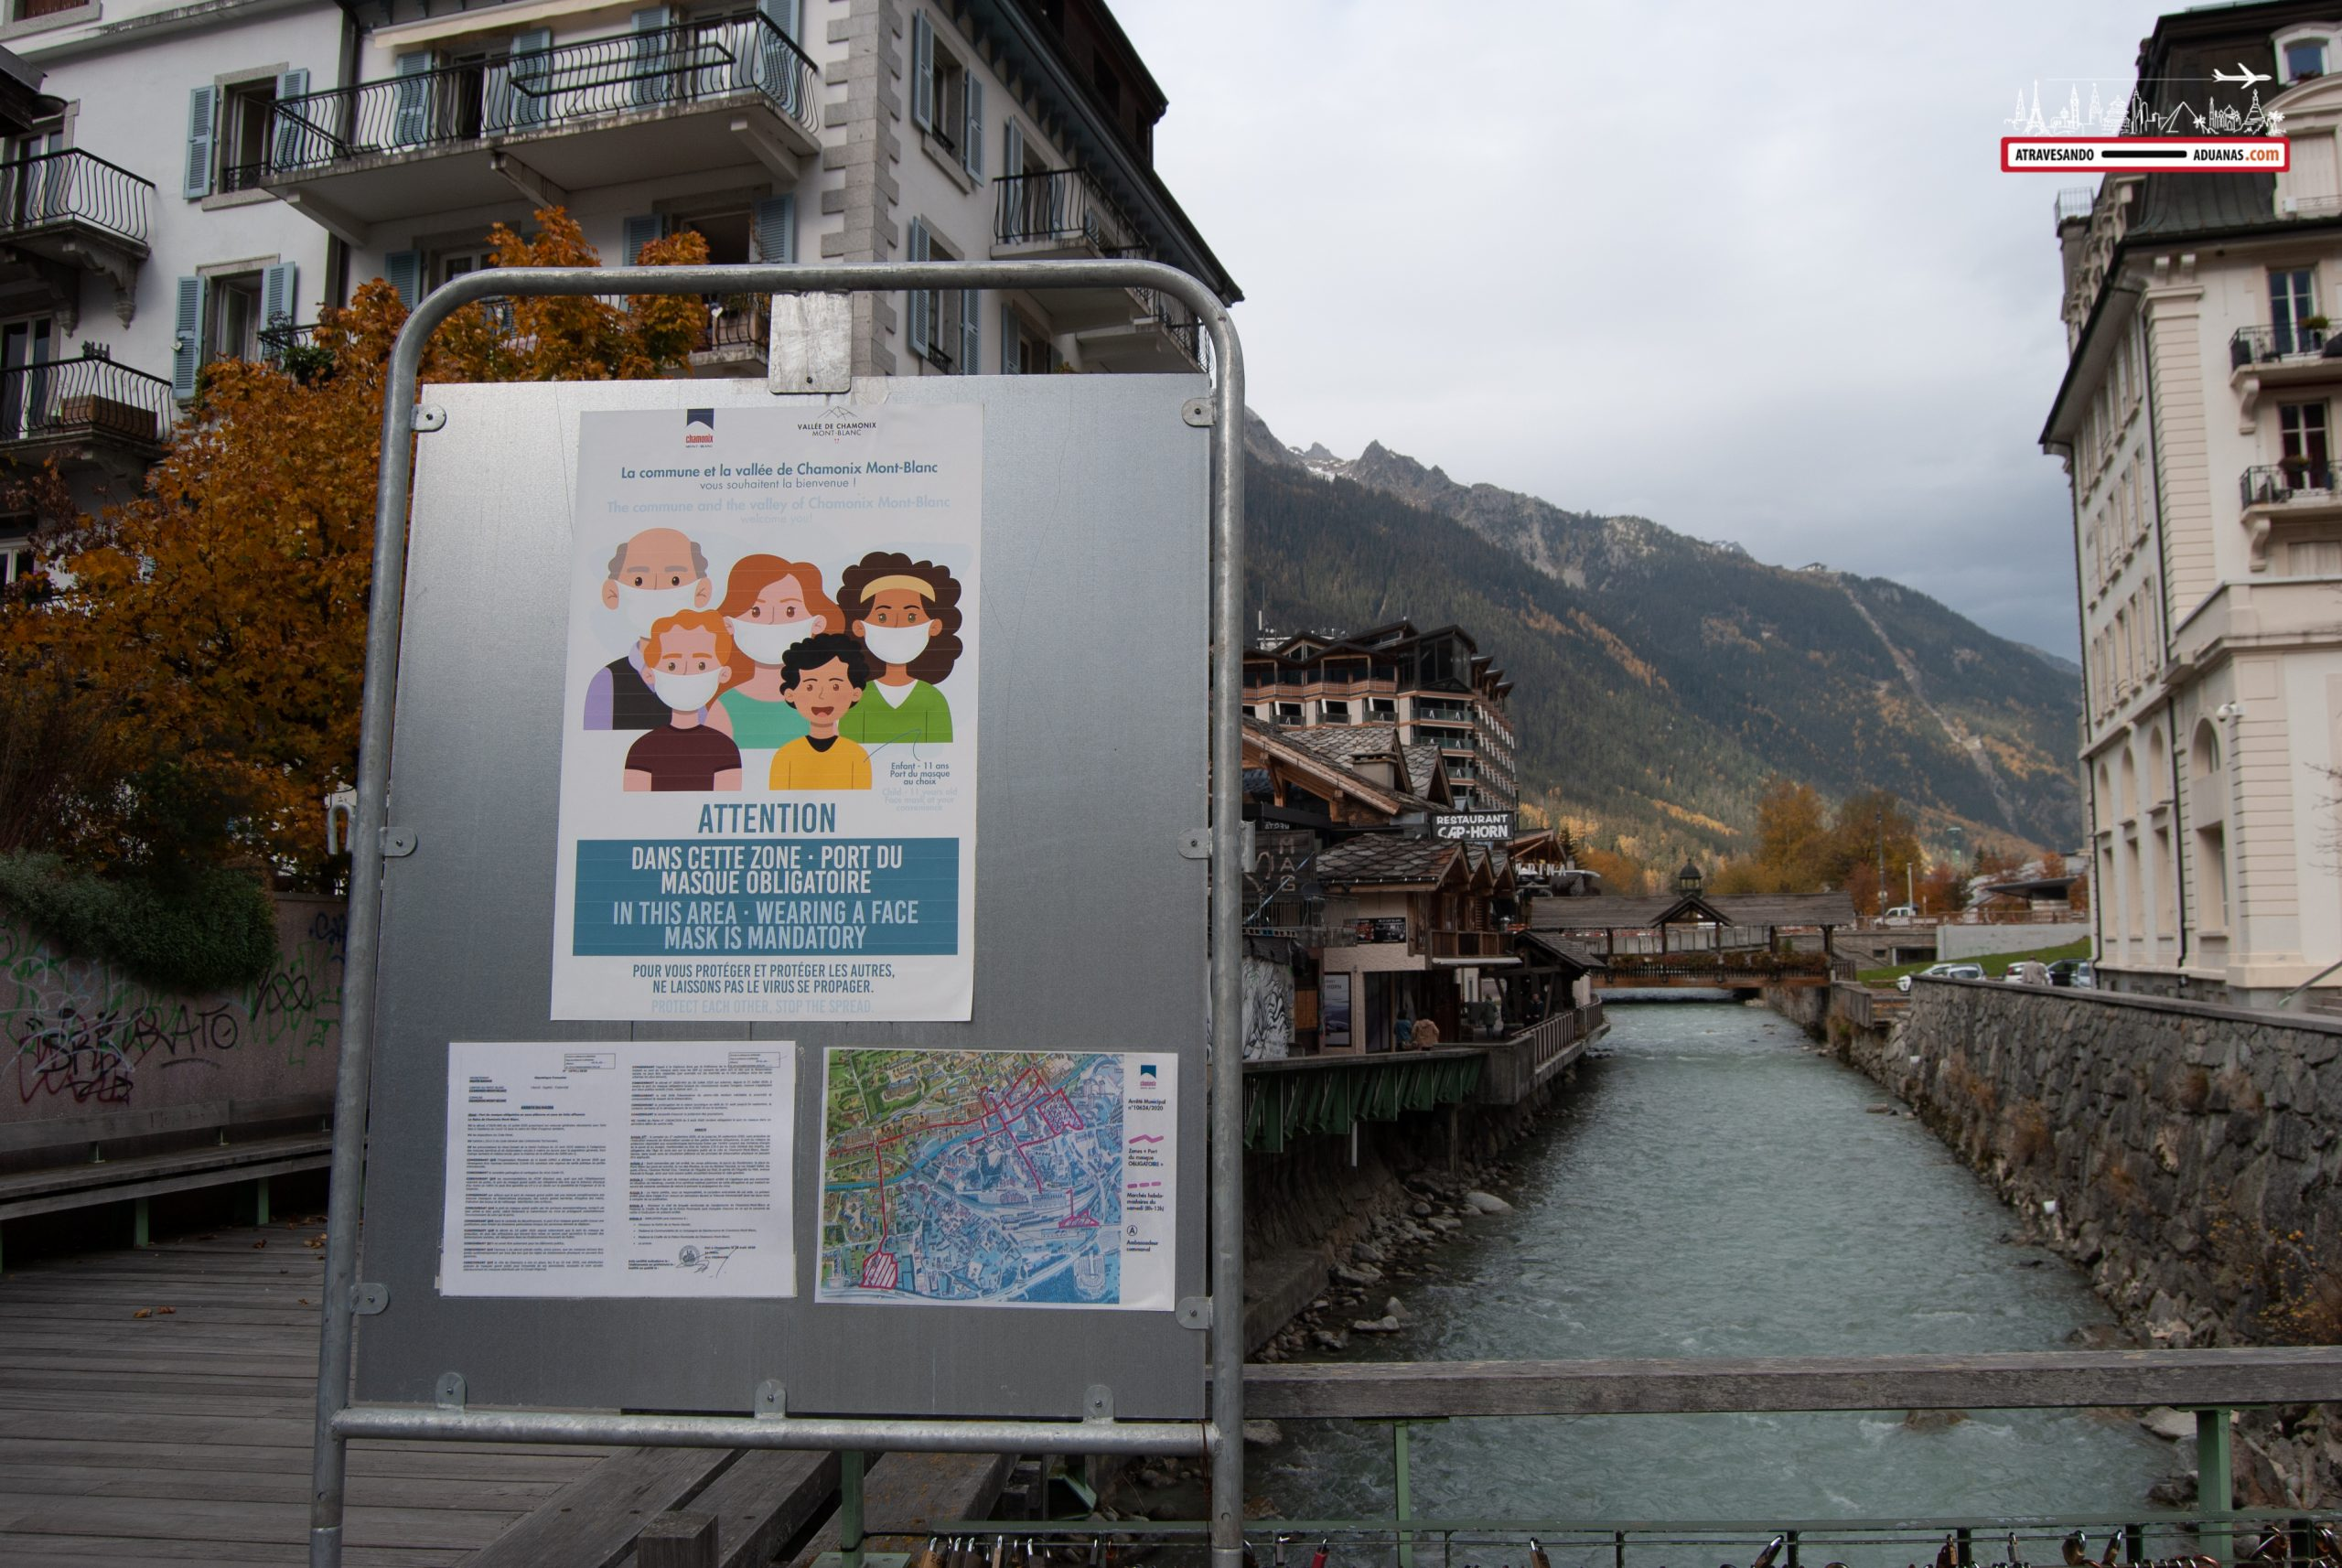 Mascarilla obligatoria en Chamonix-Mont Blanc